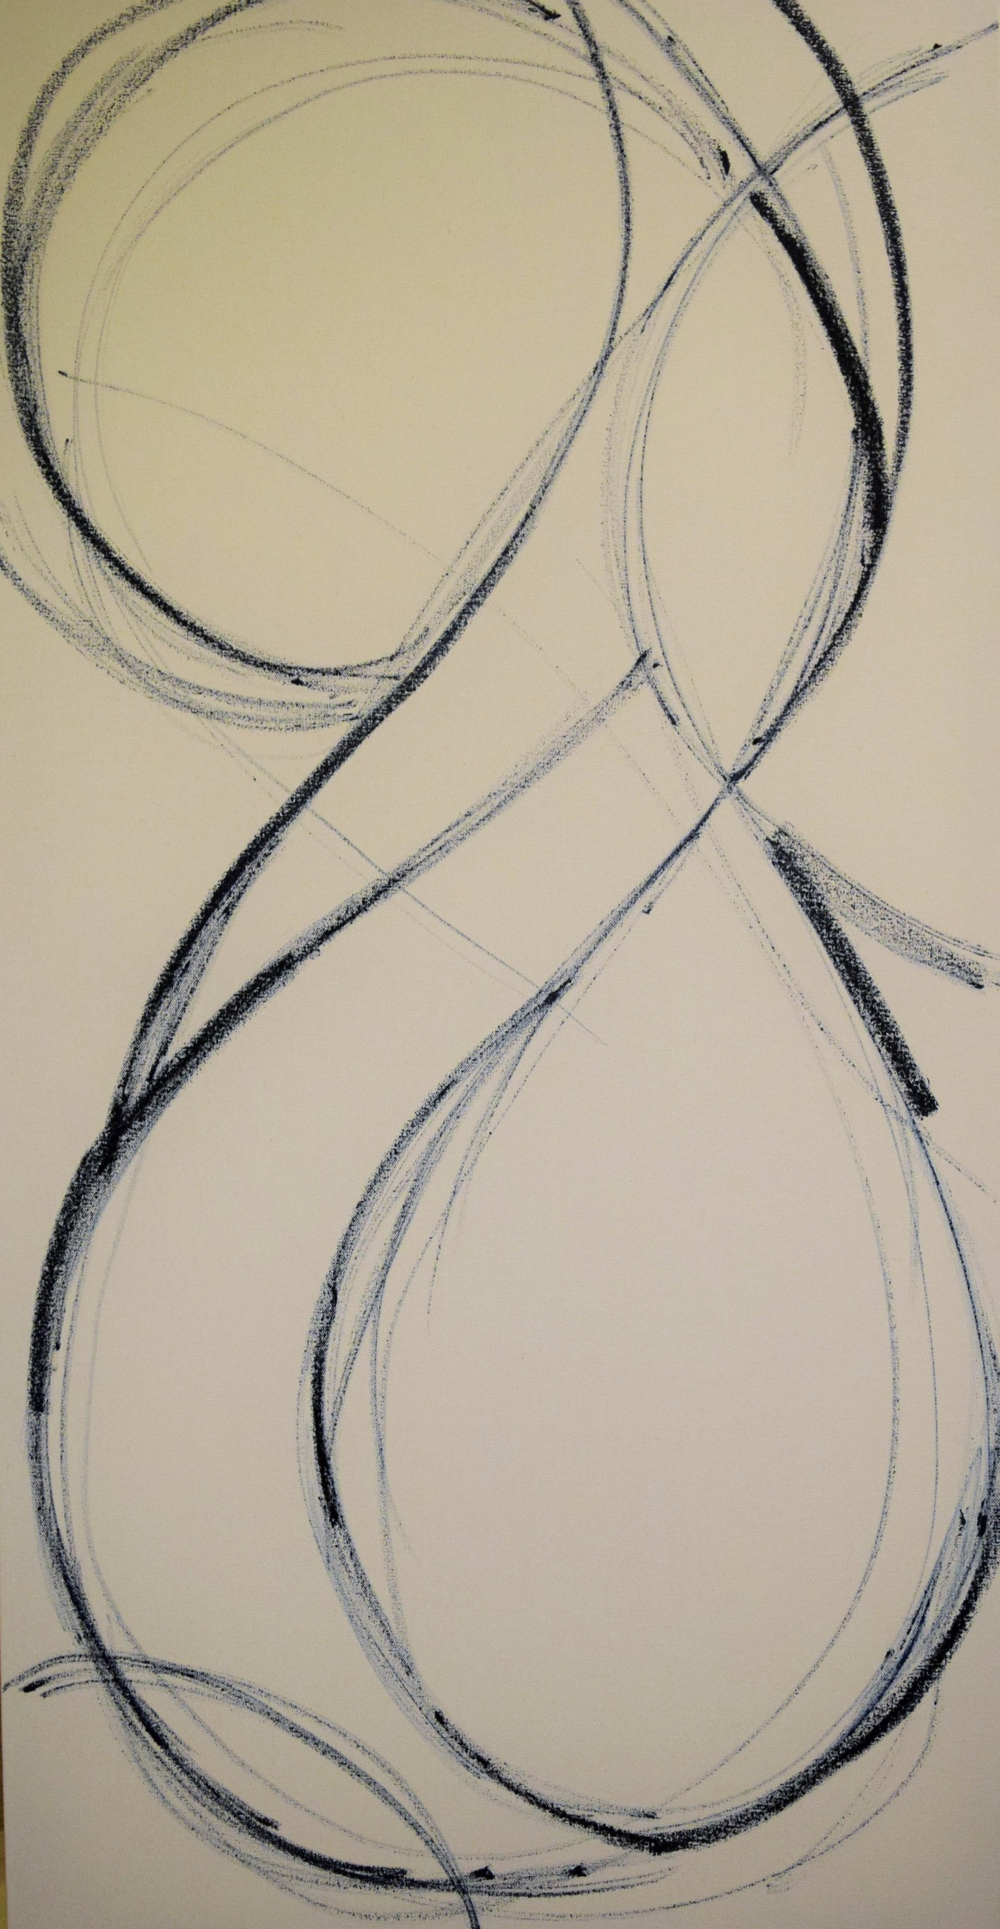 Figure  1 : Sketch. Oil stick on canvas.